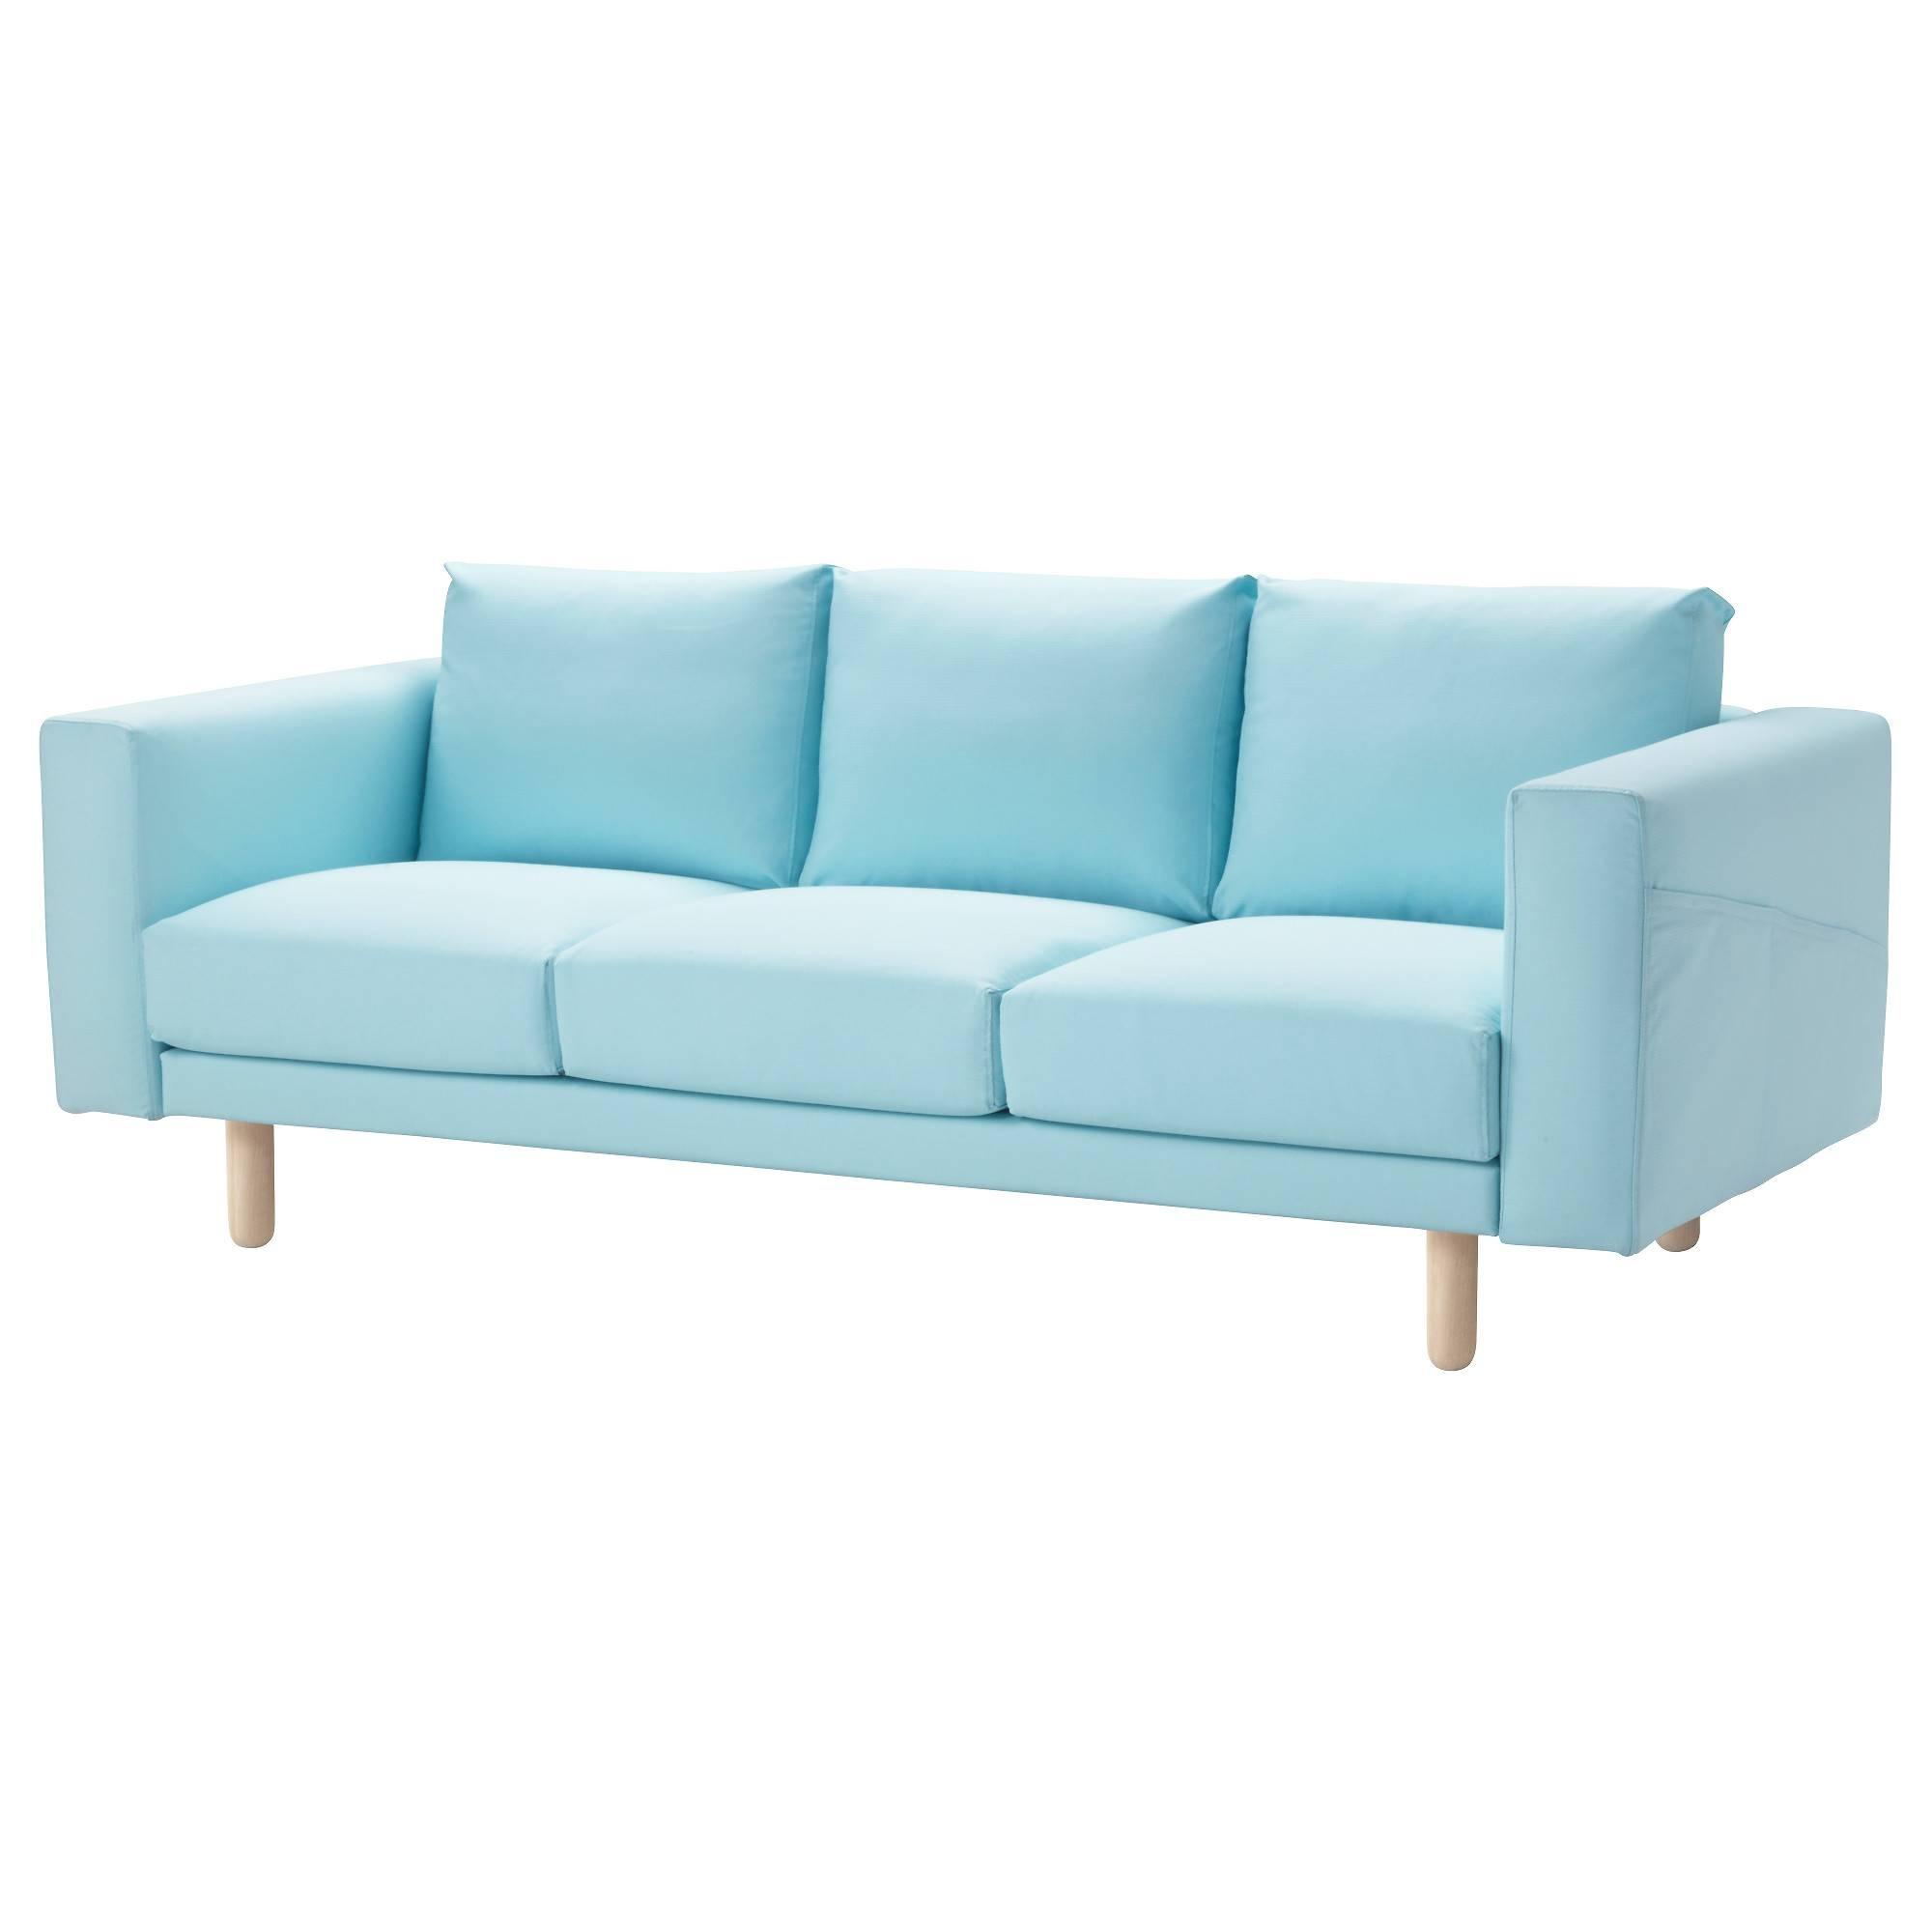 Norsborg Sofa - Finnsta Dark Gray, Birch - Ikea intended for Aqua Sofa Beds (Image 24 of 30)